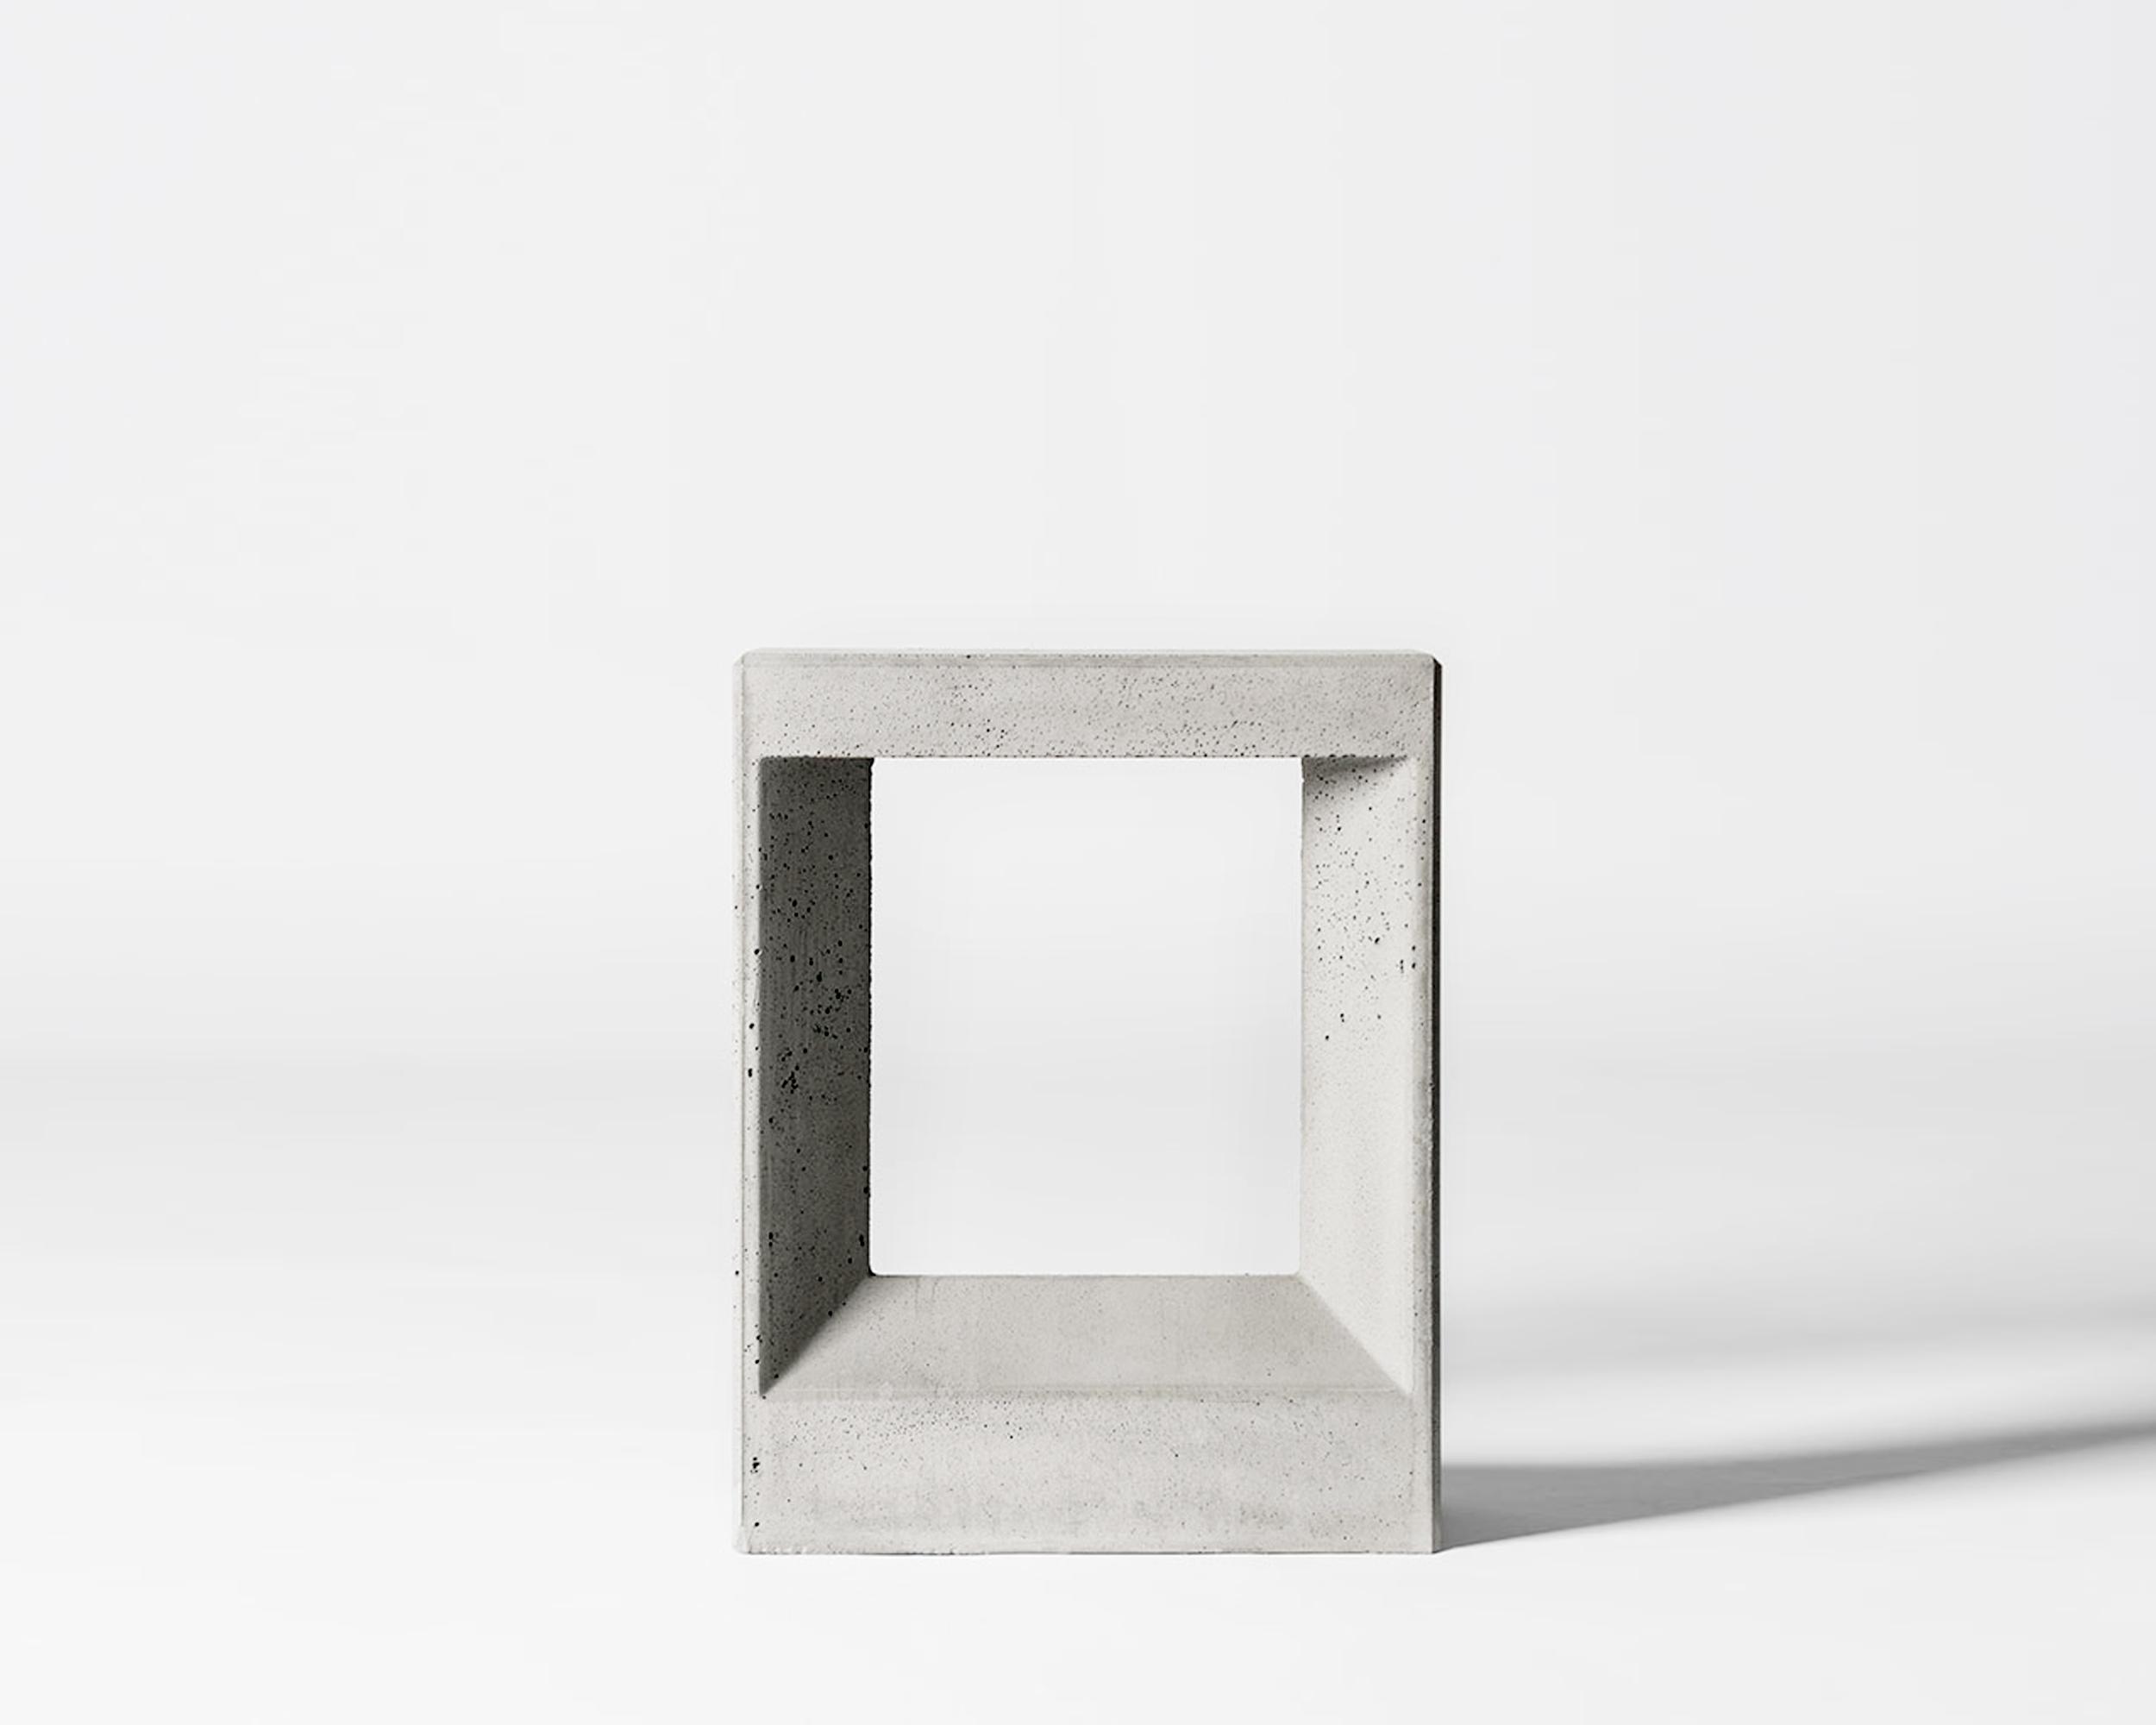 Frame_1_Bentu_Design_Lamp